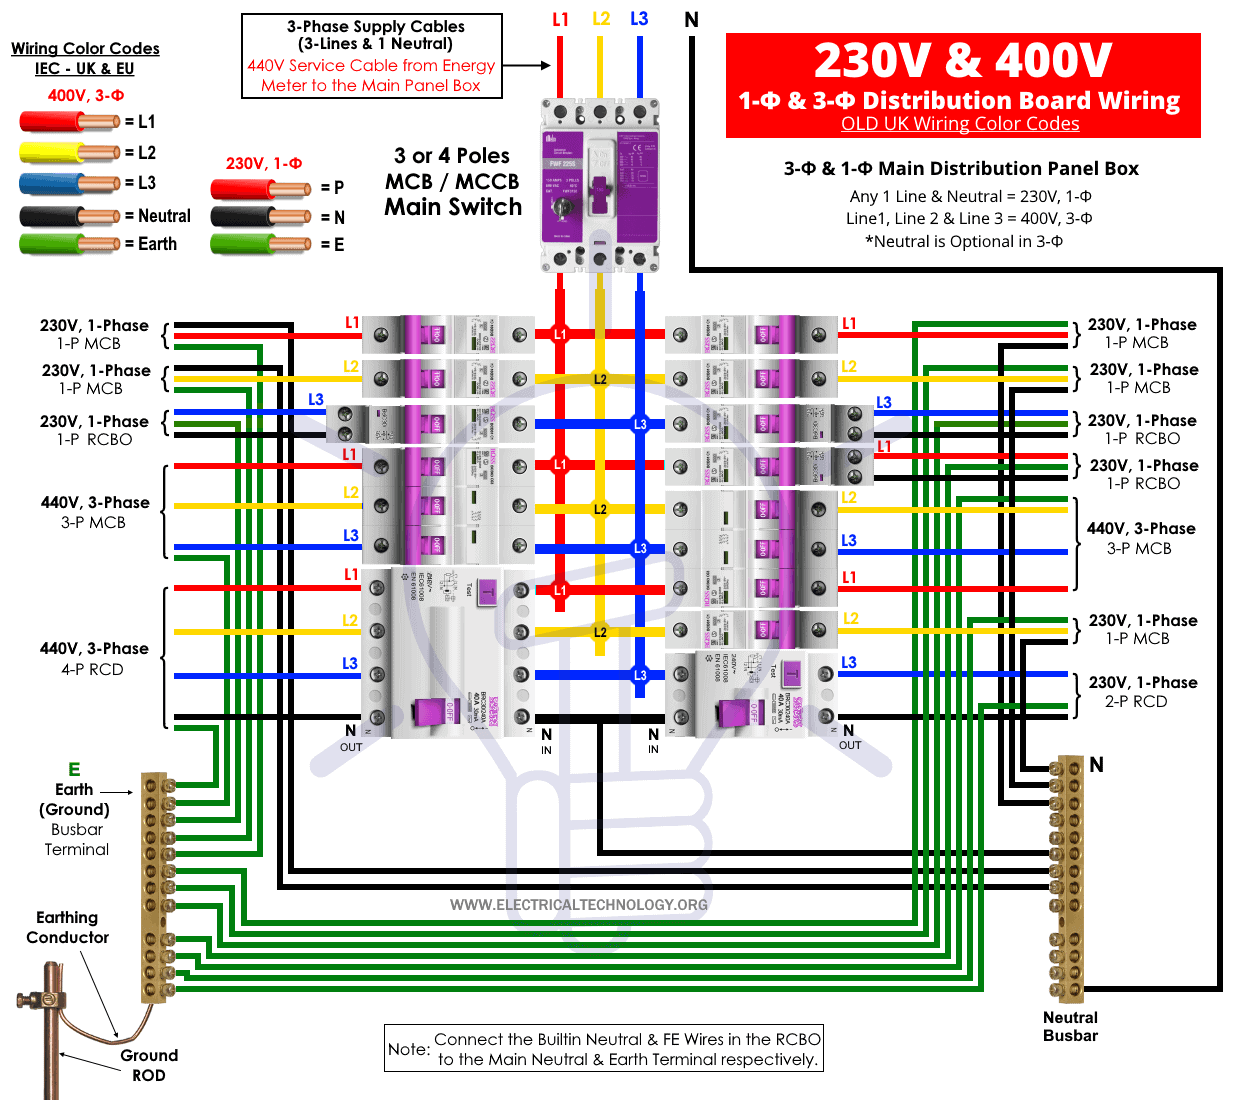 400-230V Distribution Board Wiring - Old UK Wiring Color Codes